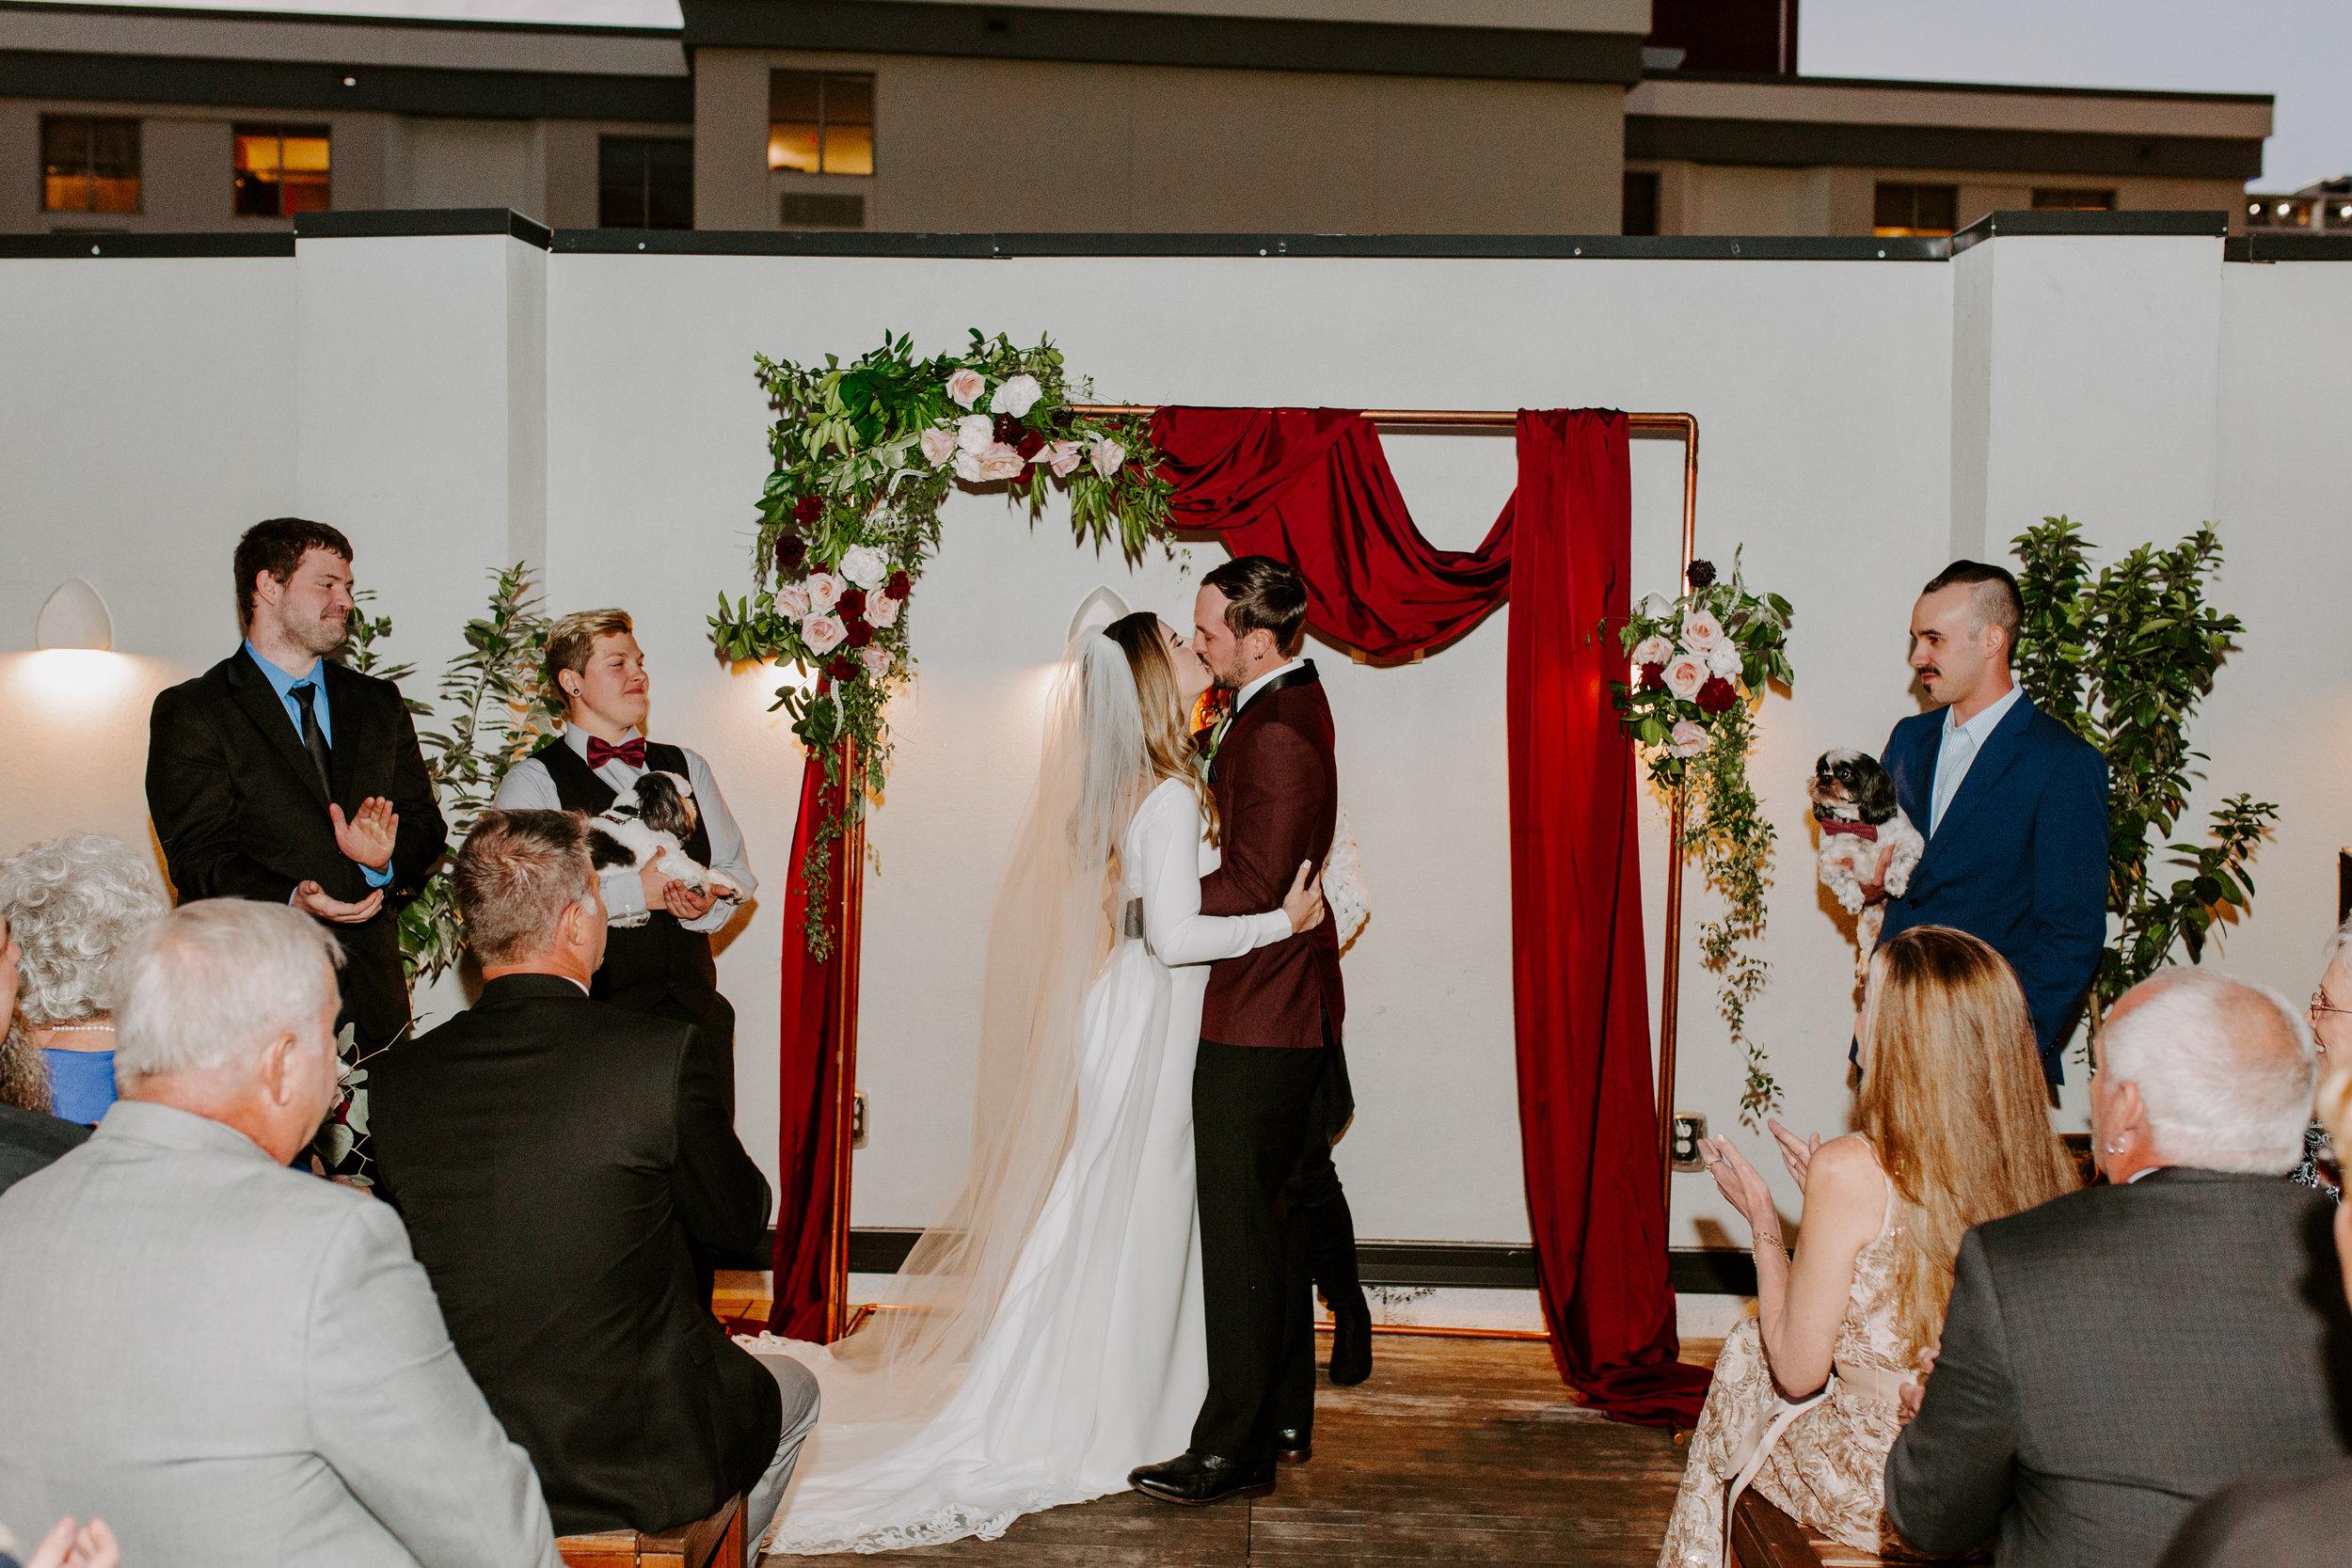 Catahoula Hotel Rooftop Wedding Ceremony New Orleans Wedding Photographer Ashley Biltz Photography44.jpg